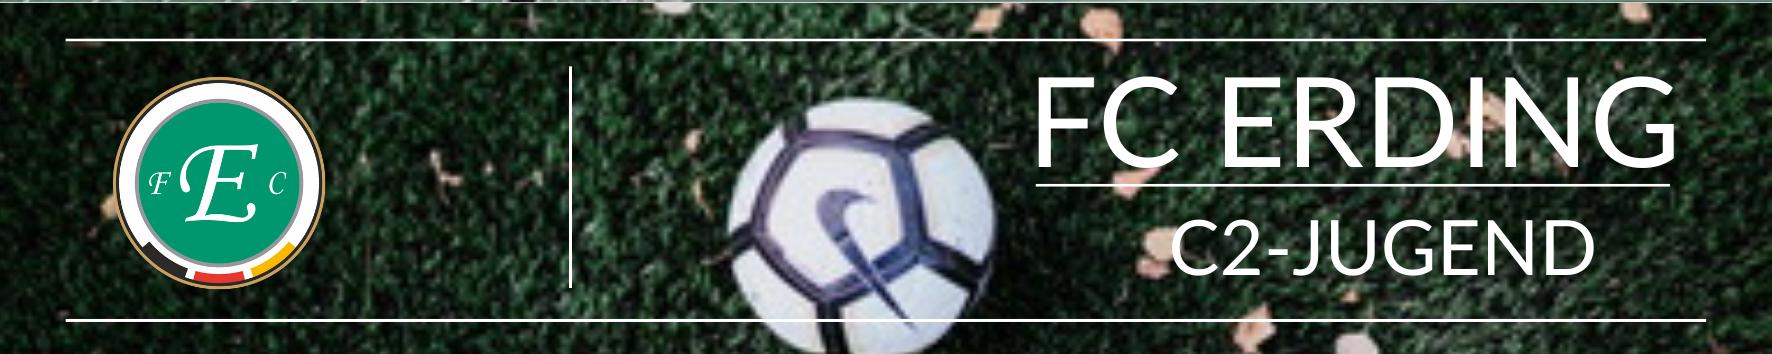 FC Erding C2-Jugend Saison 2021/2022